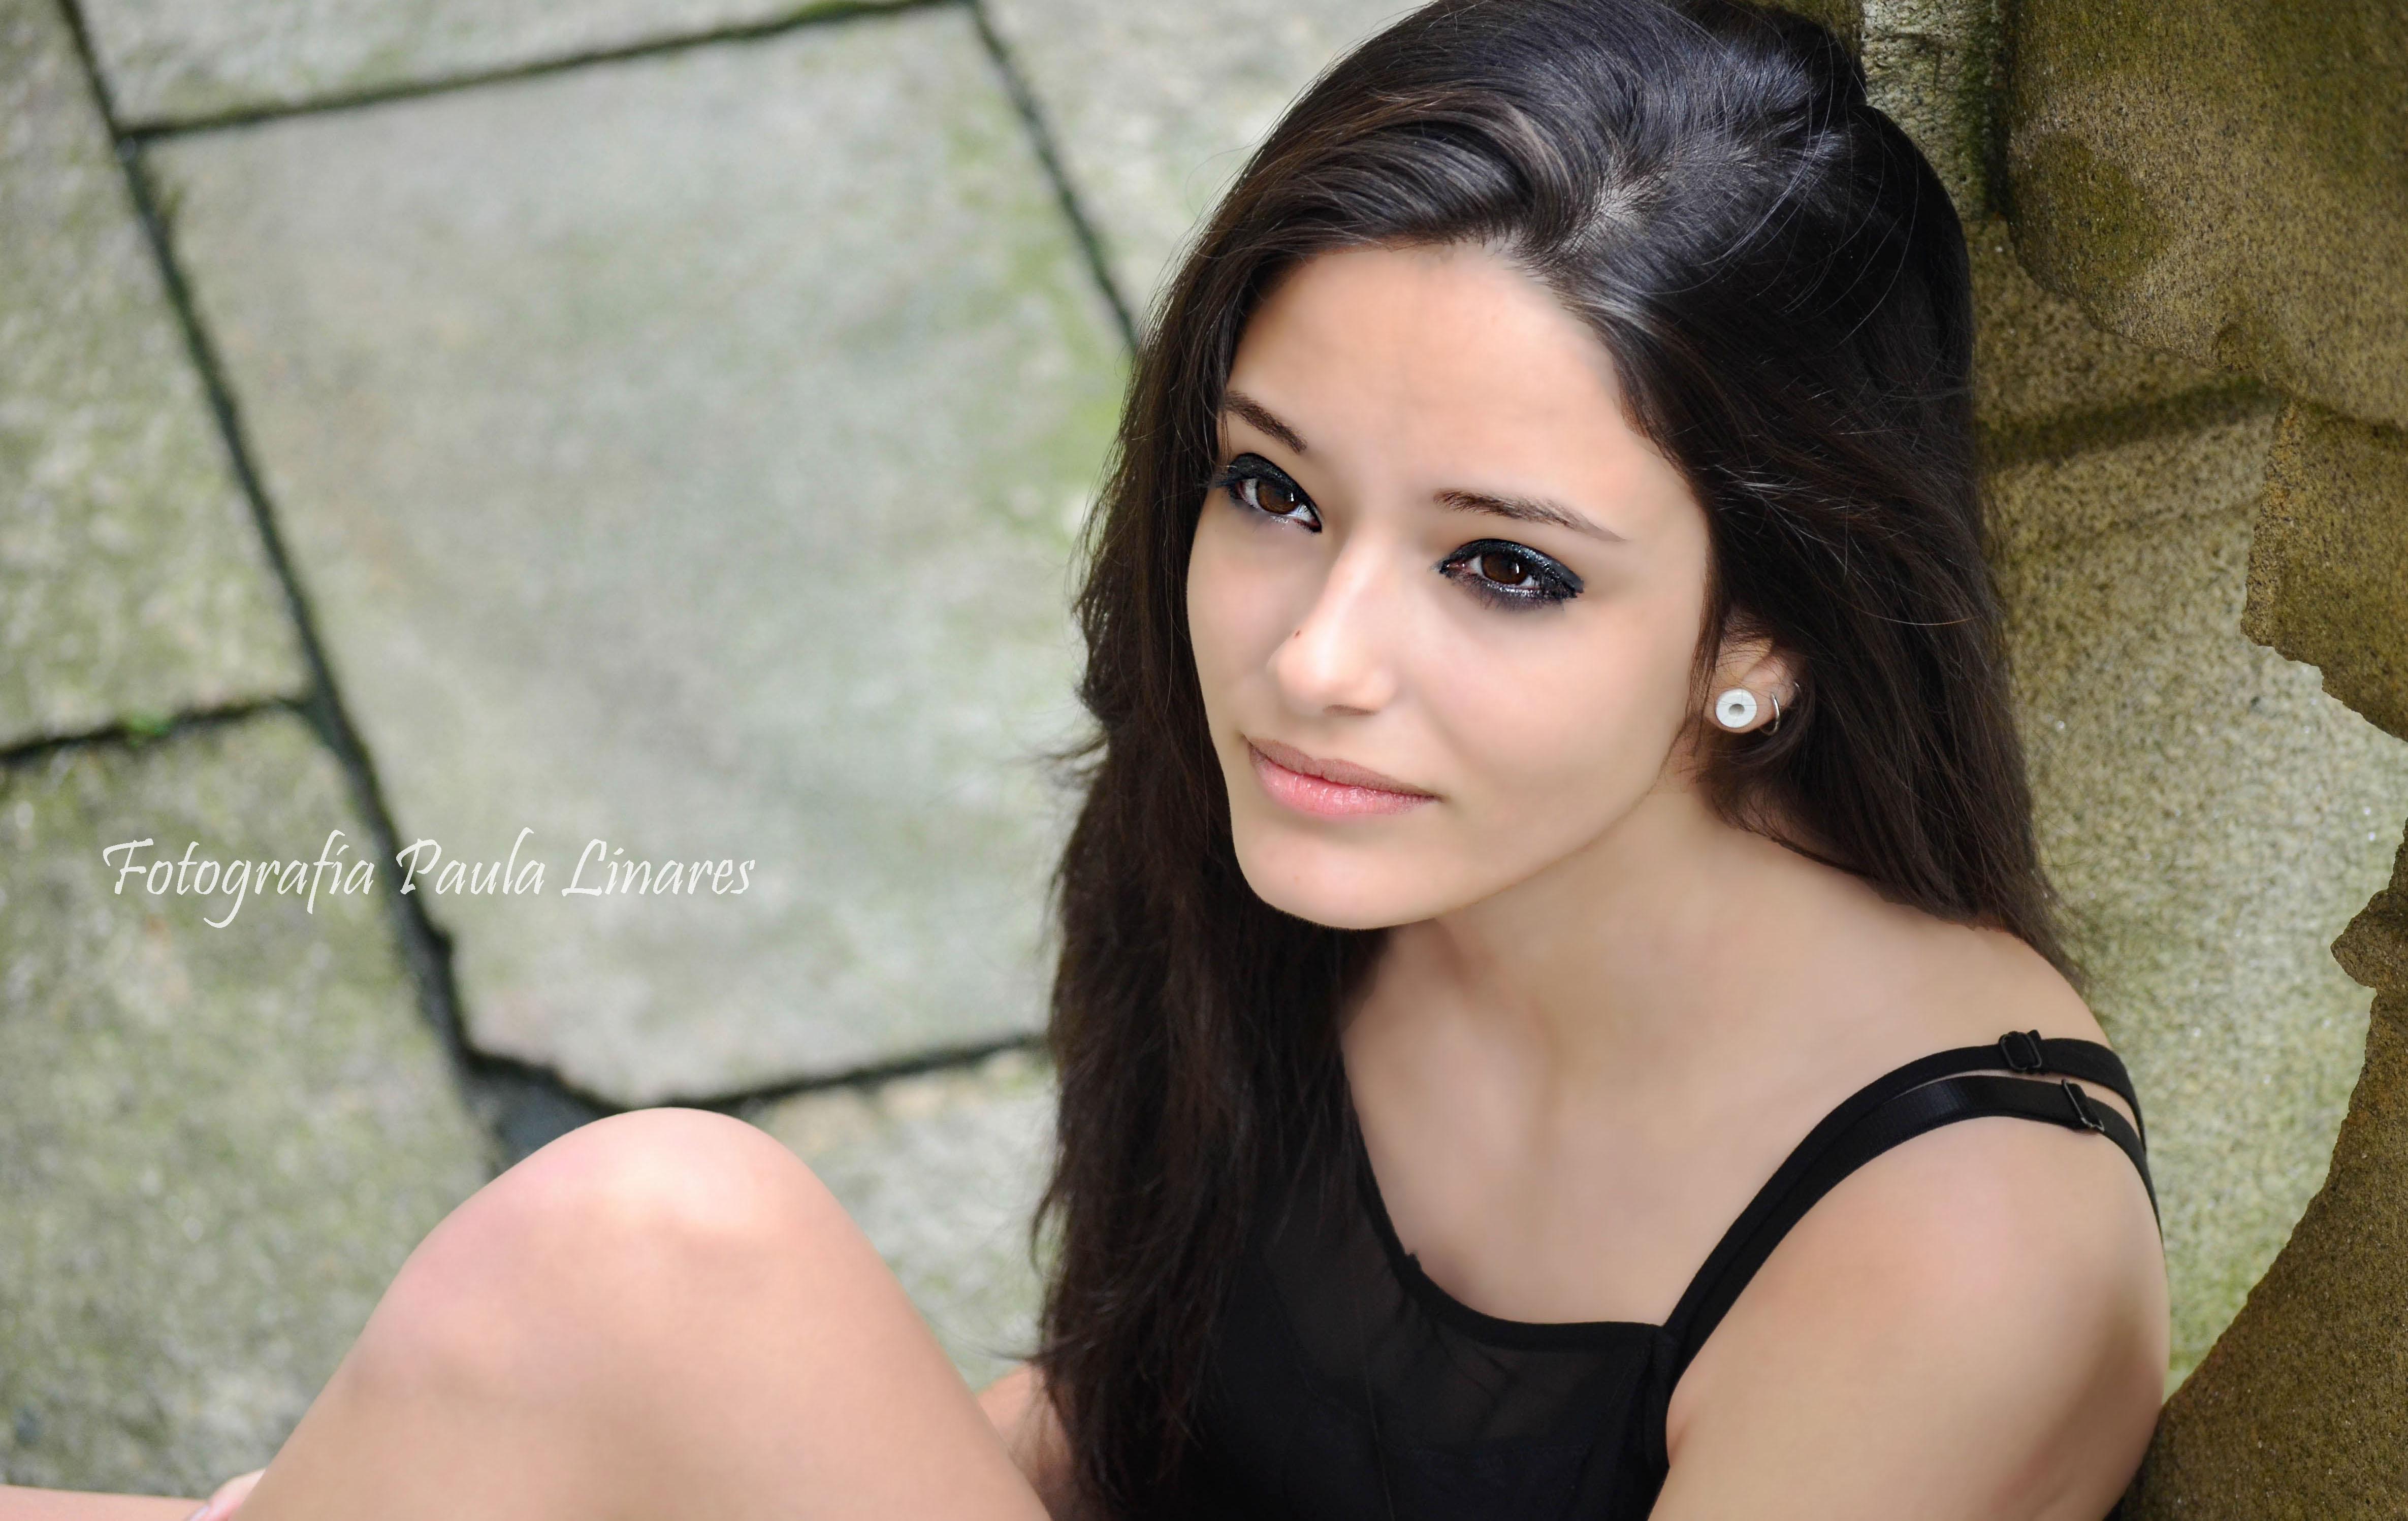 Espana girl